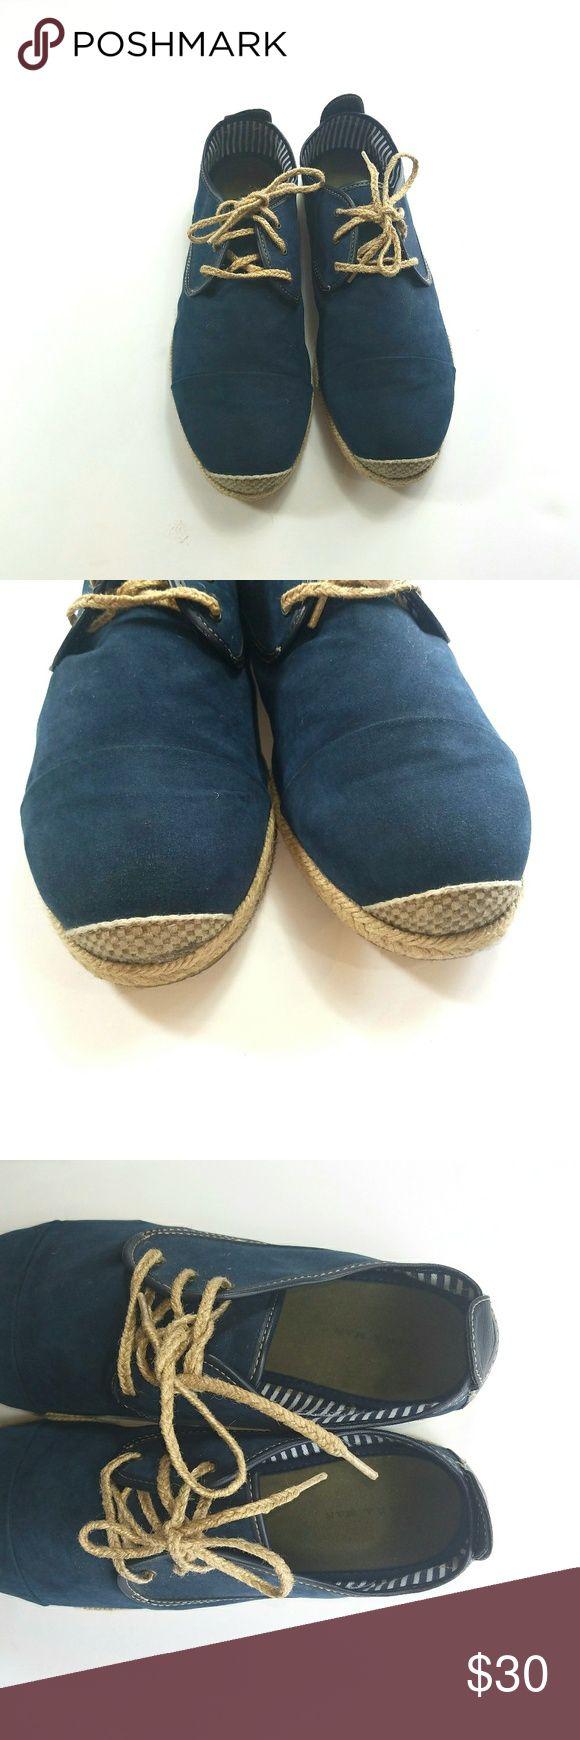 """ACCEPTING 30% OFF OFFERS"" SALE [Zara Man] Blue lace up shoes Zara Man Blue lace up shoes.   Men's Size 42(US 11) Zara Shoes"